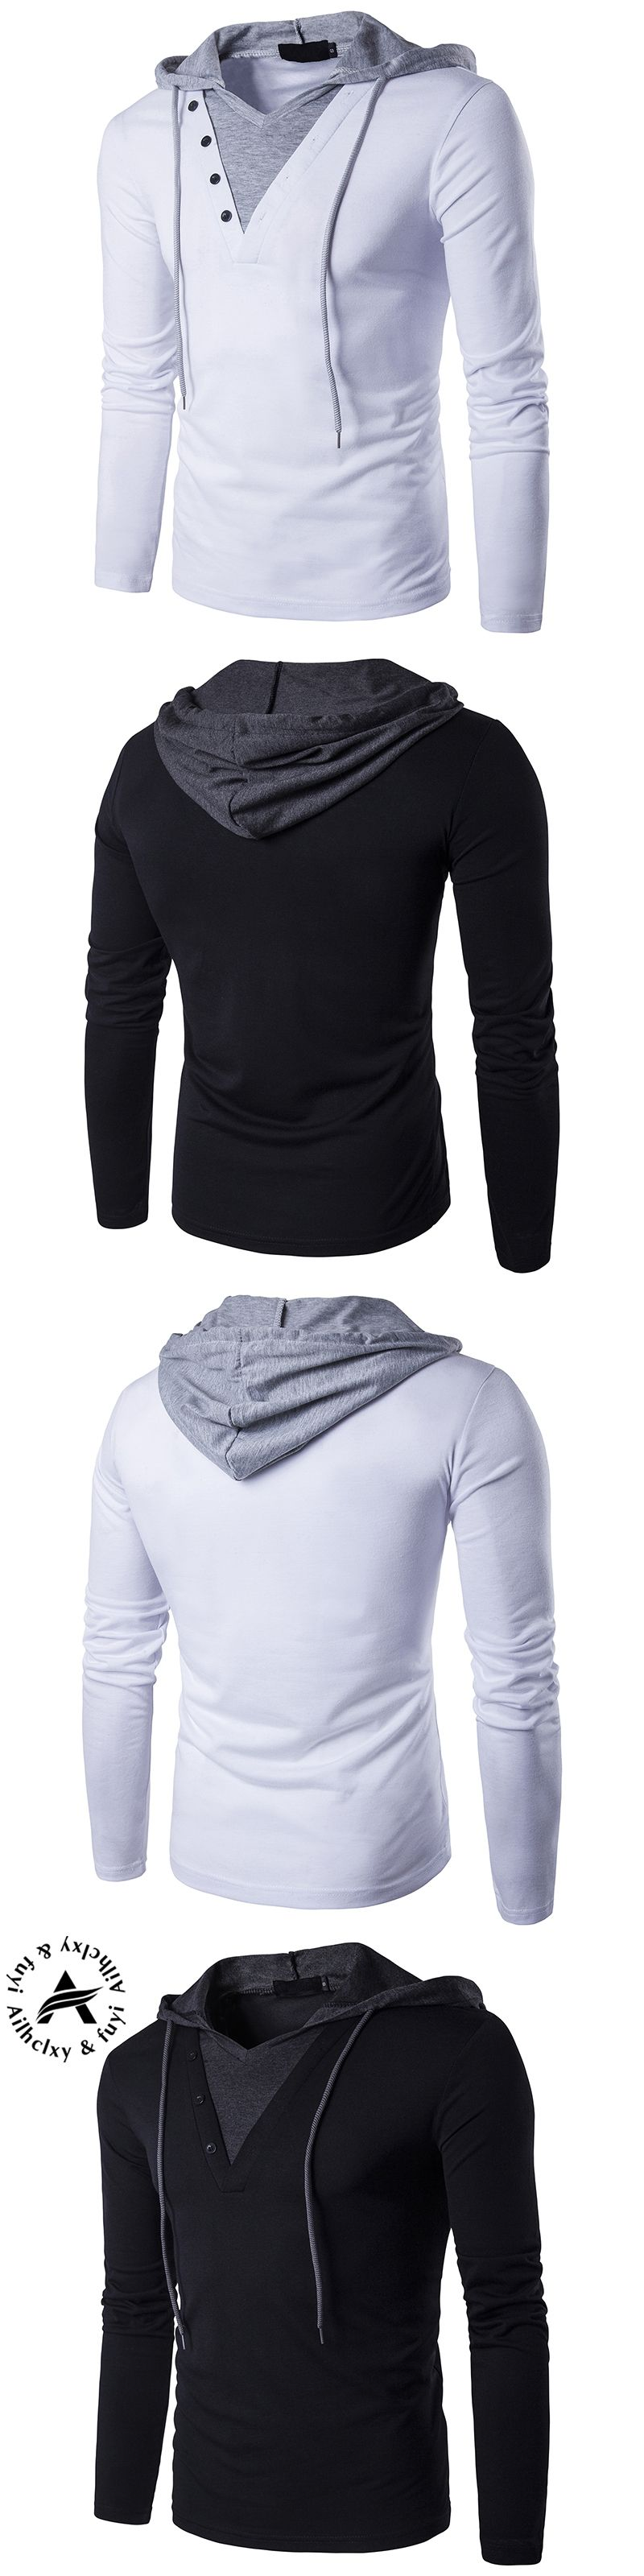 1480f84fa874 New summer vintage short sleeve neck 3d printed t shirt men brand cotton  mens t shirts fashion 2018 tops Men s Clothing